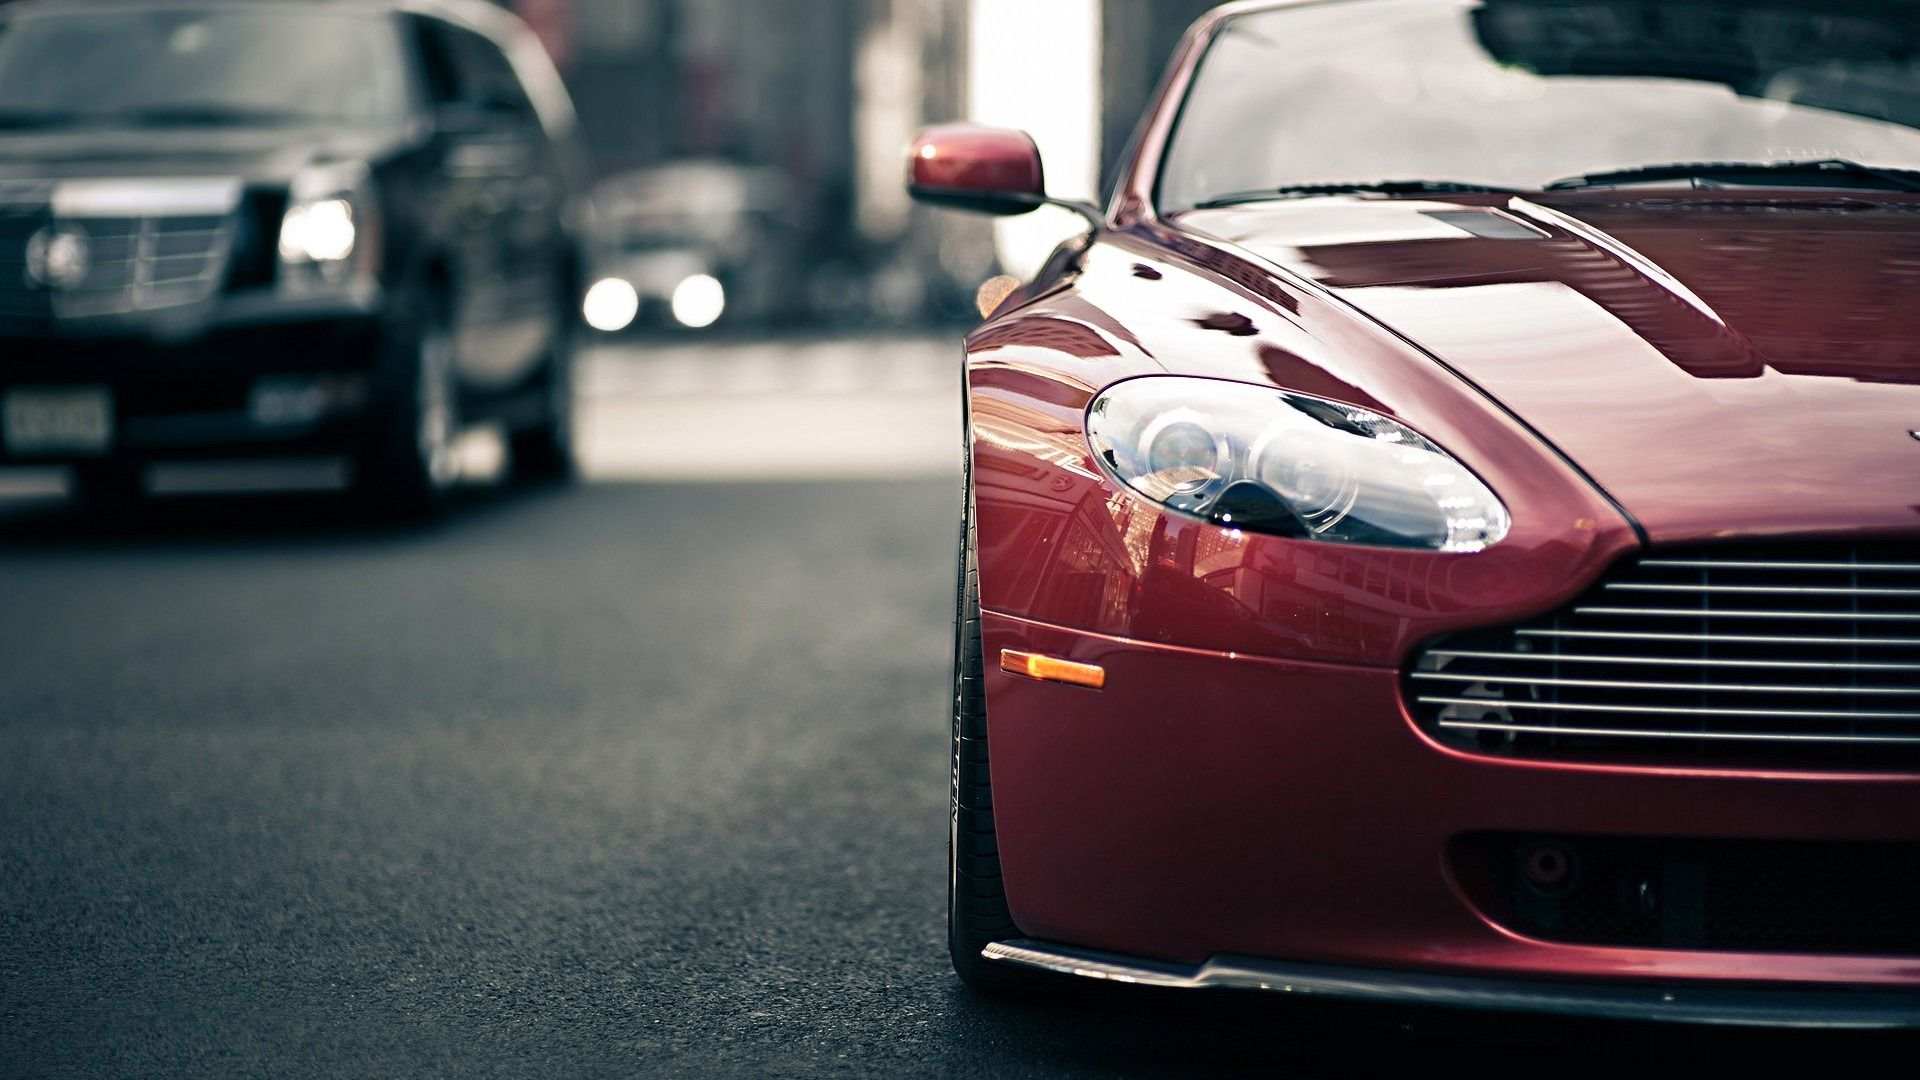 Aston Martin V8 Vantage Hd 1080p Wallpapers Download Cars Cars